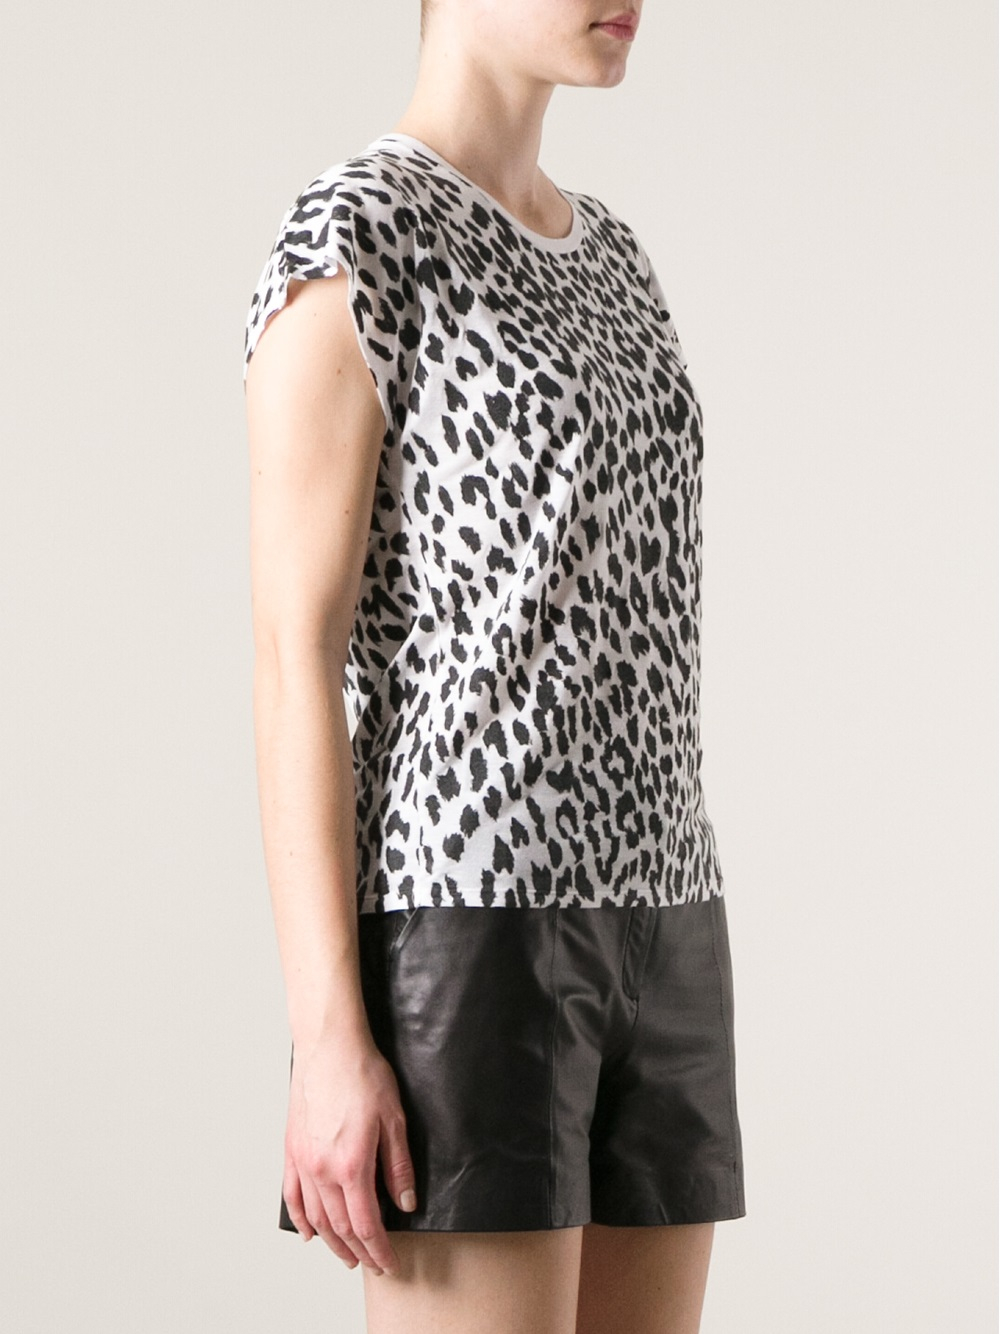 saint laurent leopard print t shirt in black lyst. Black Bedroom Furniture Sets. Home Design Ideas